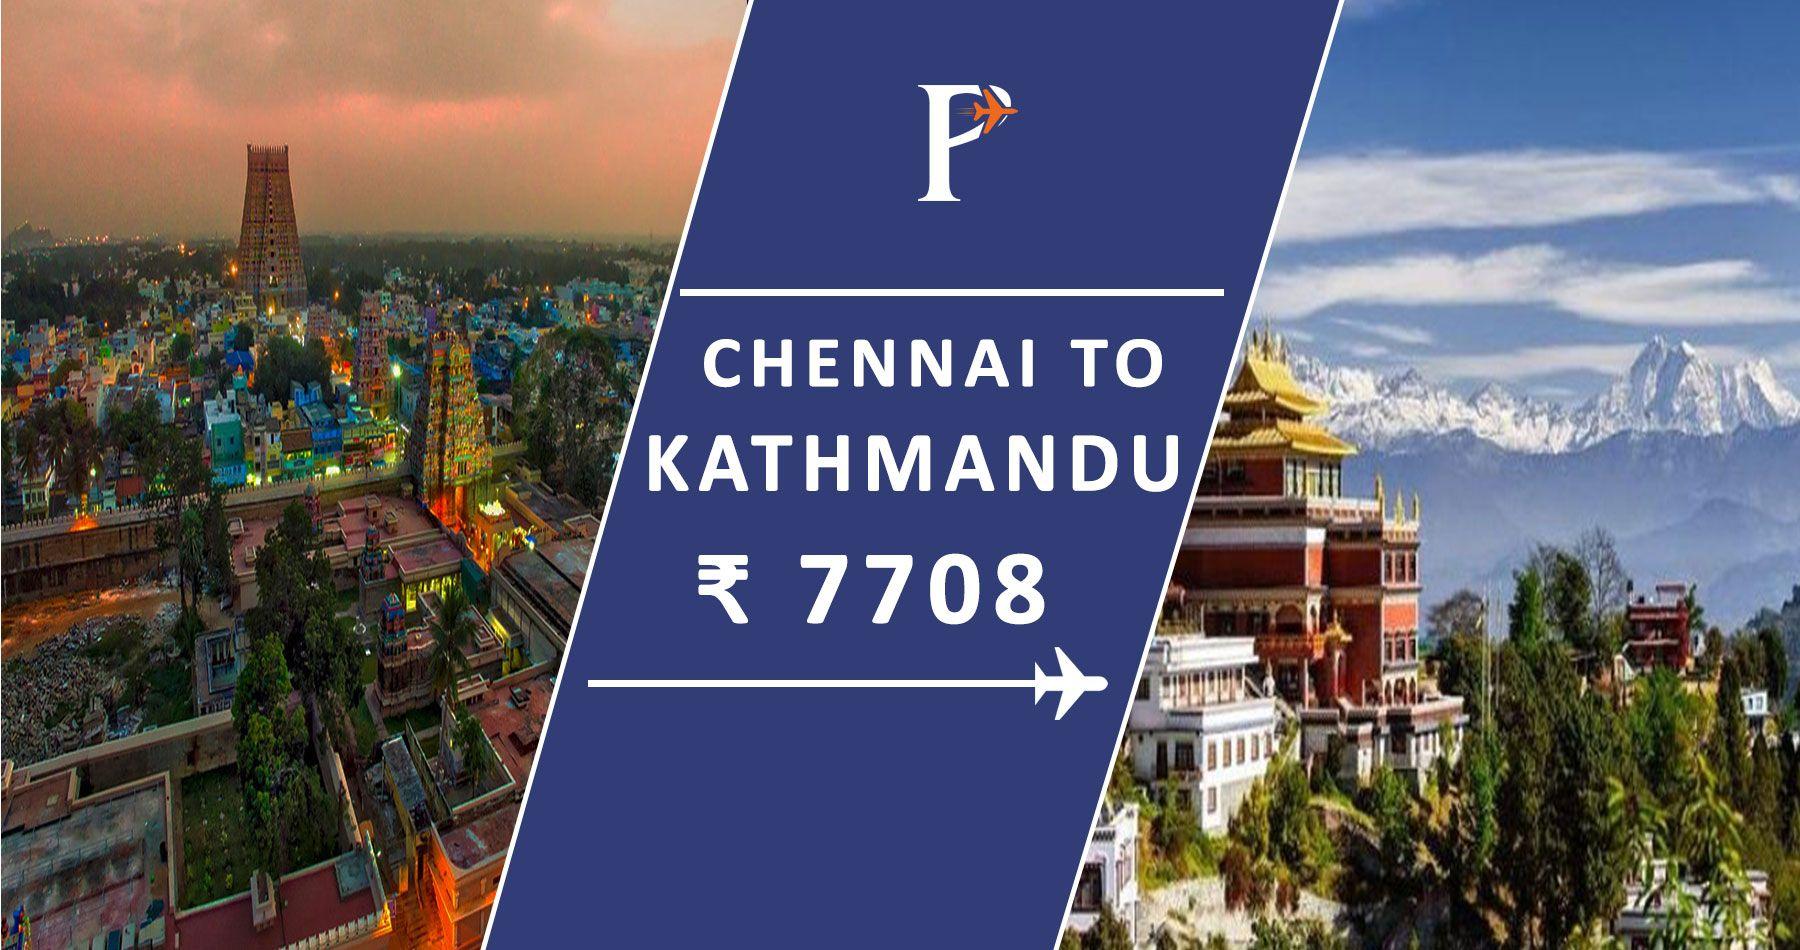 Flights from Chennai(MAA), India to Kathmandu(KTM